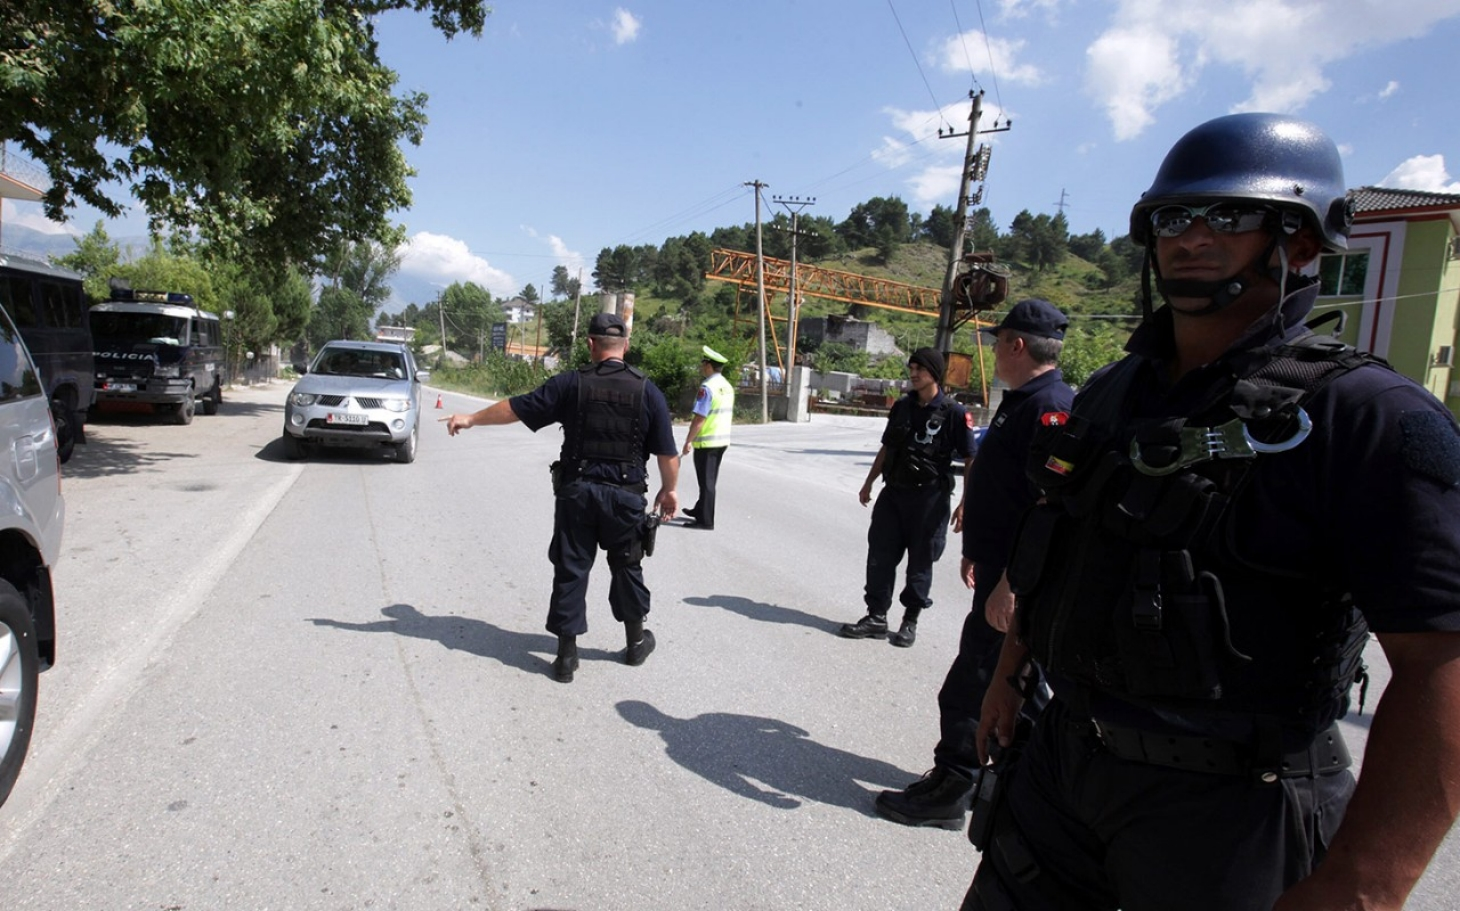 Albanian Police Storm Marijuana Village After Growers